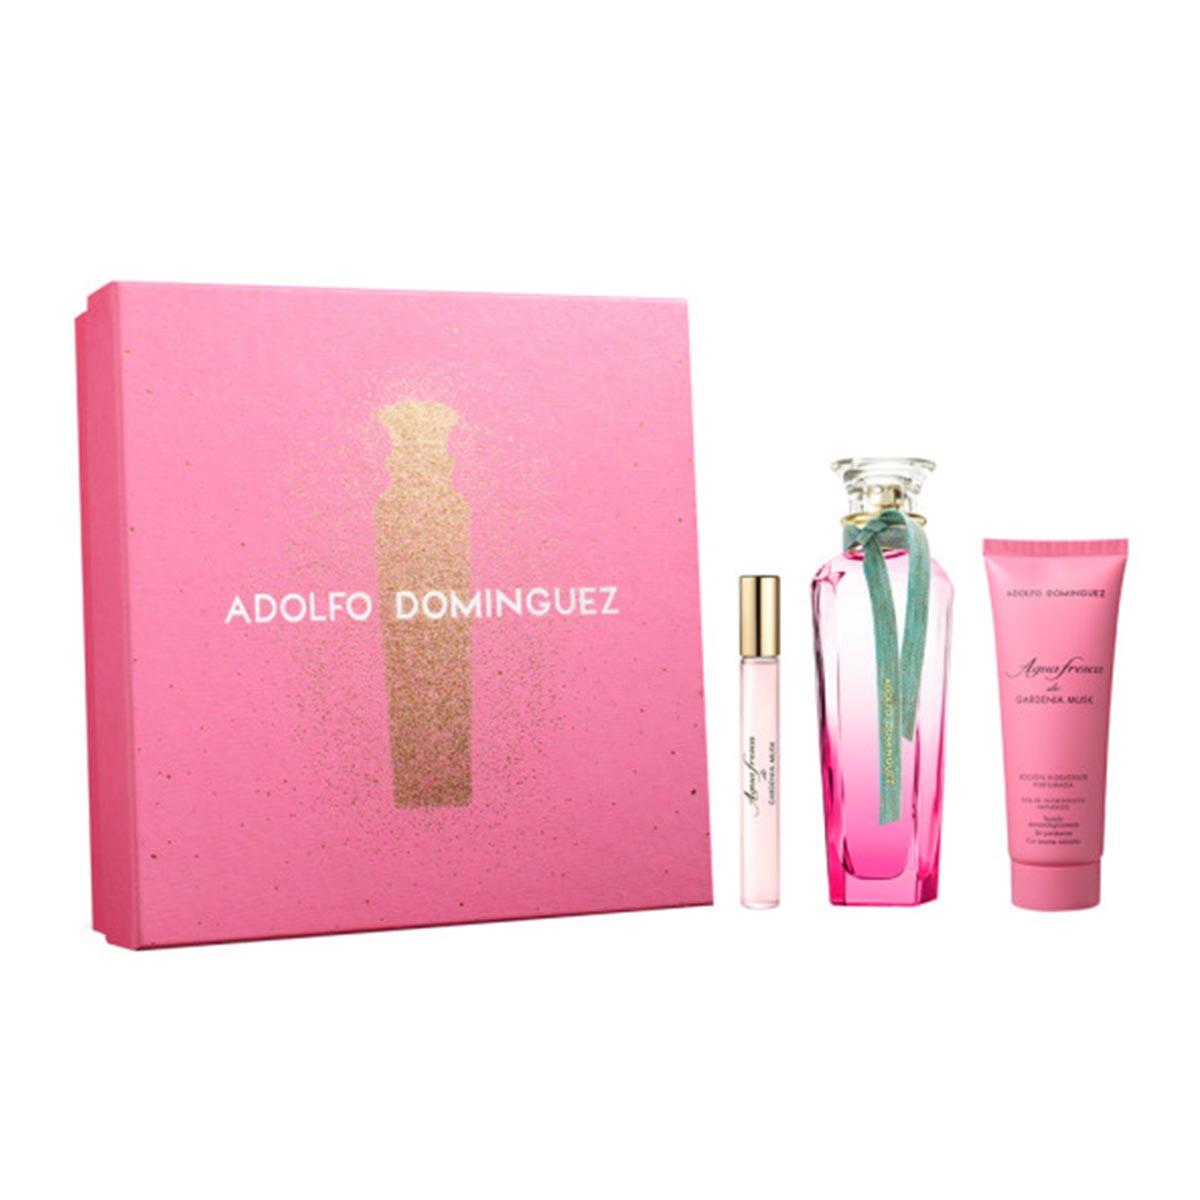 Adolfo dominguez agua fresca de gardenia musk eau de toilette 120ml vaporizador perfumed body lotion 75ml miniatura